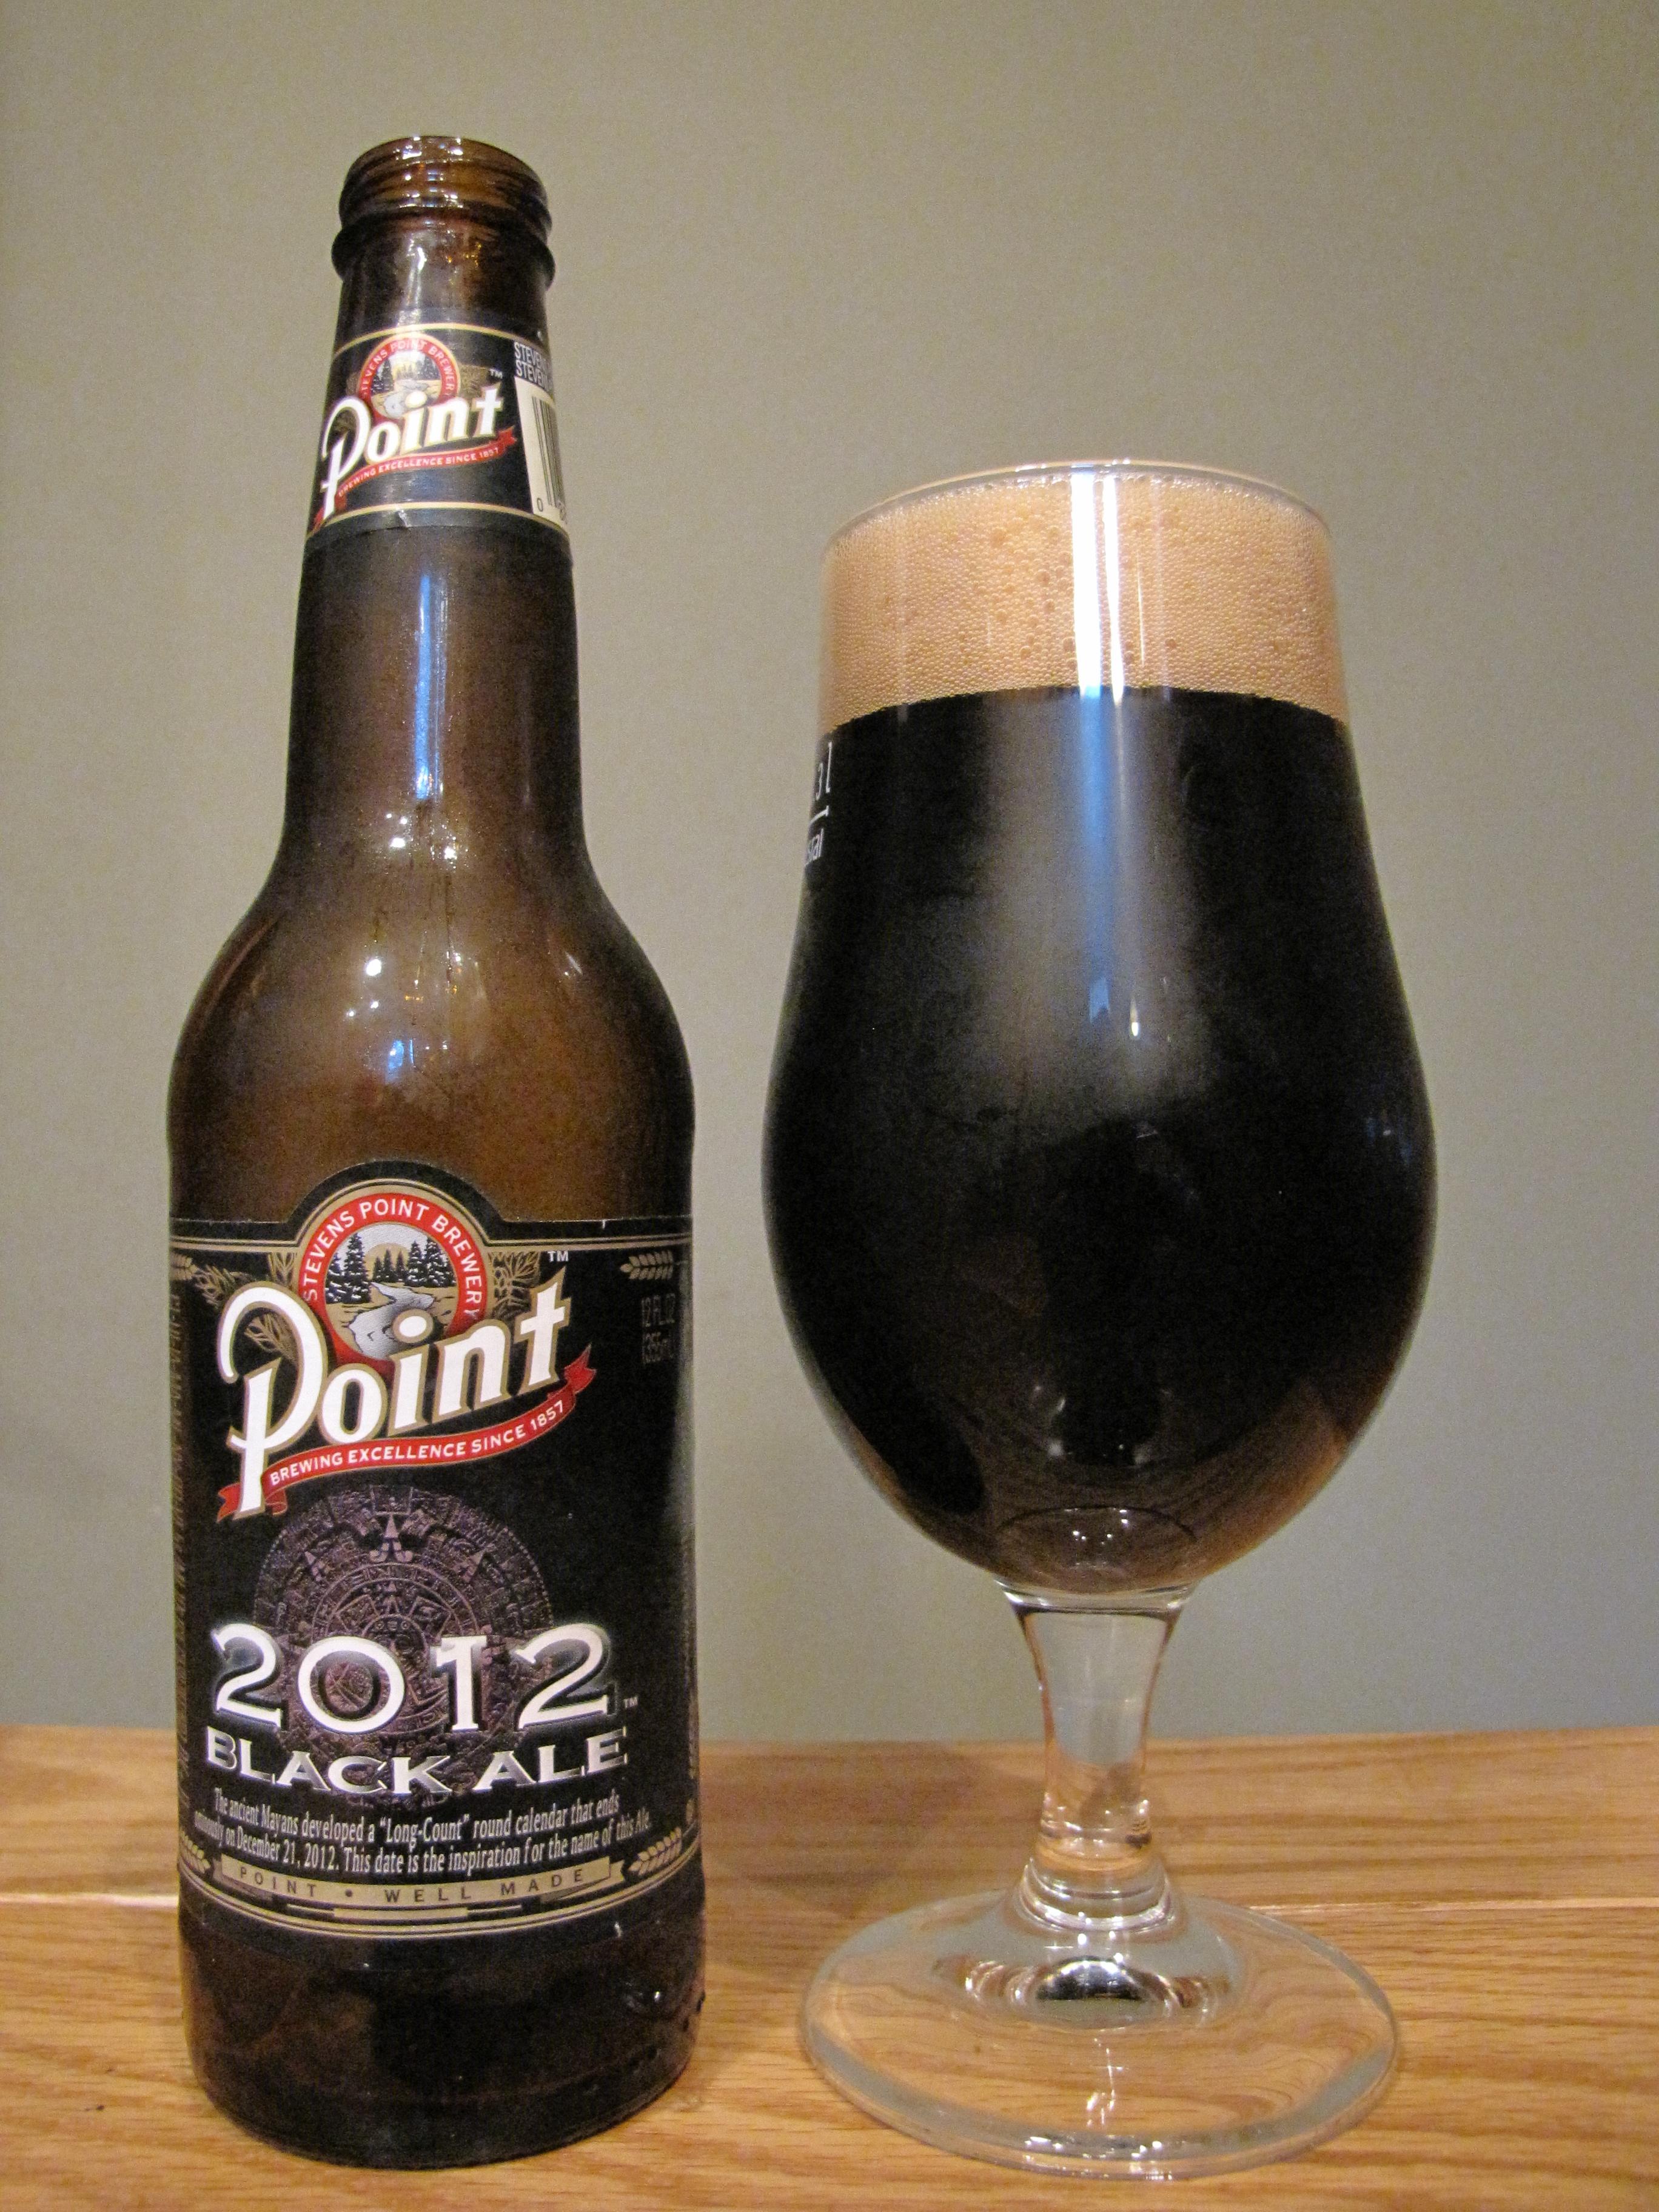 Stevens Point Black Ale (2012)